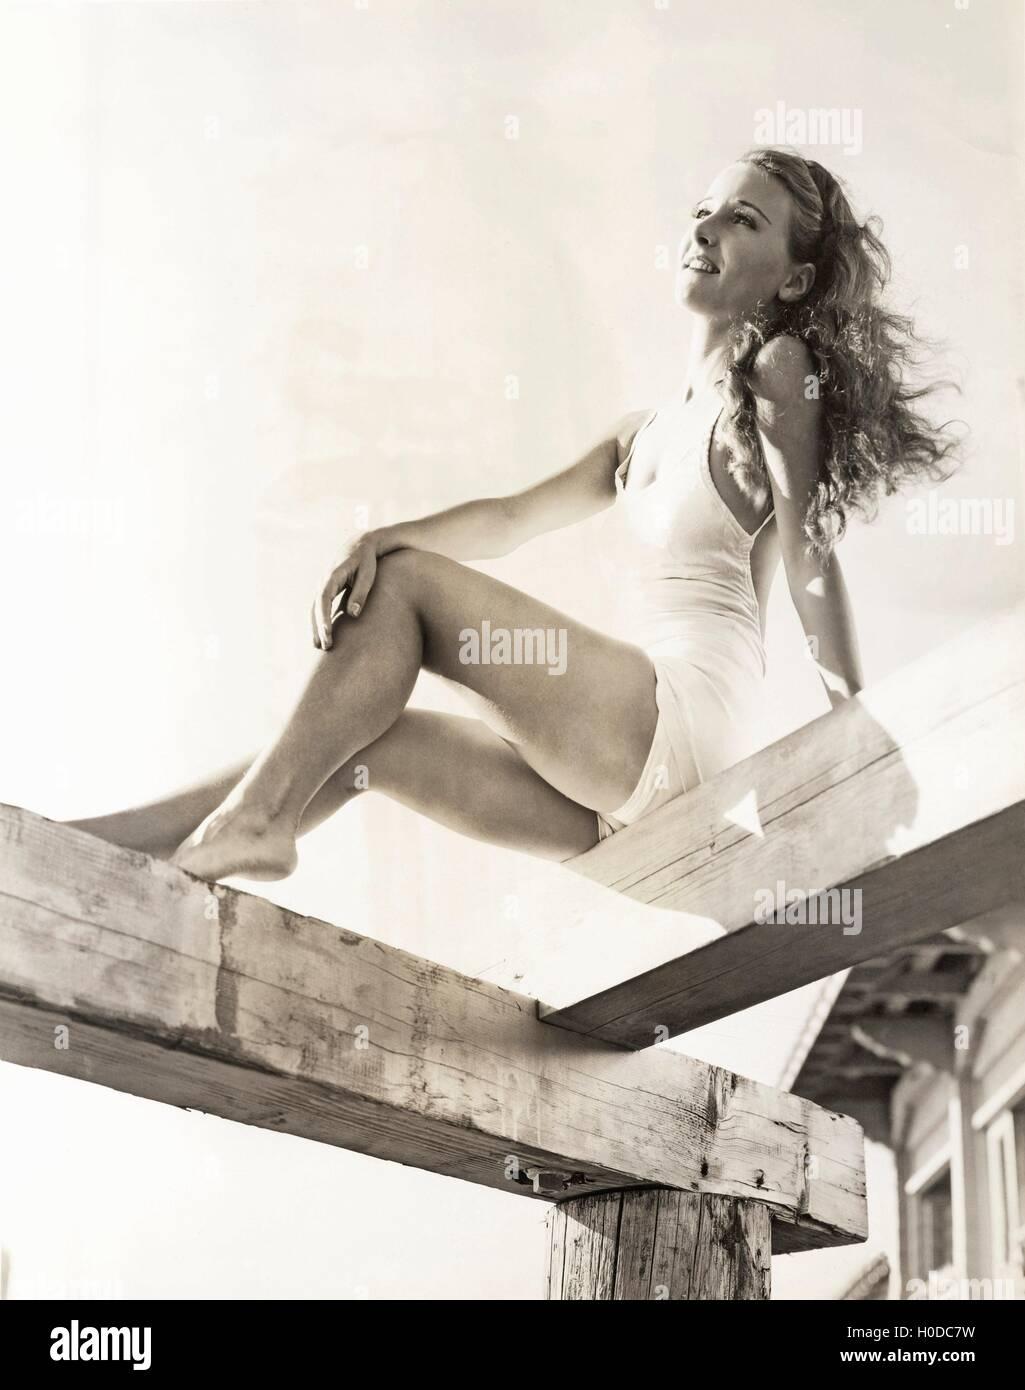 Woman sunbathing on a pier - Stock Image